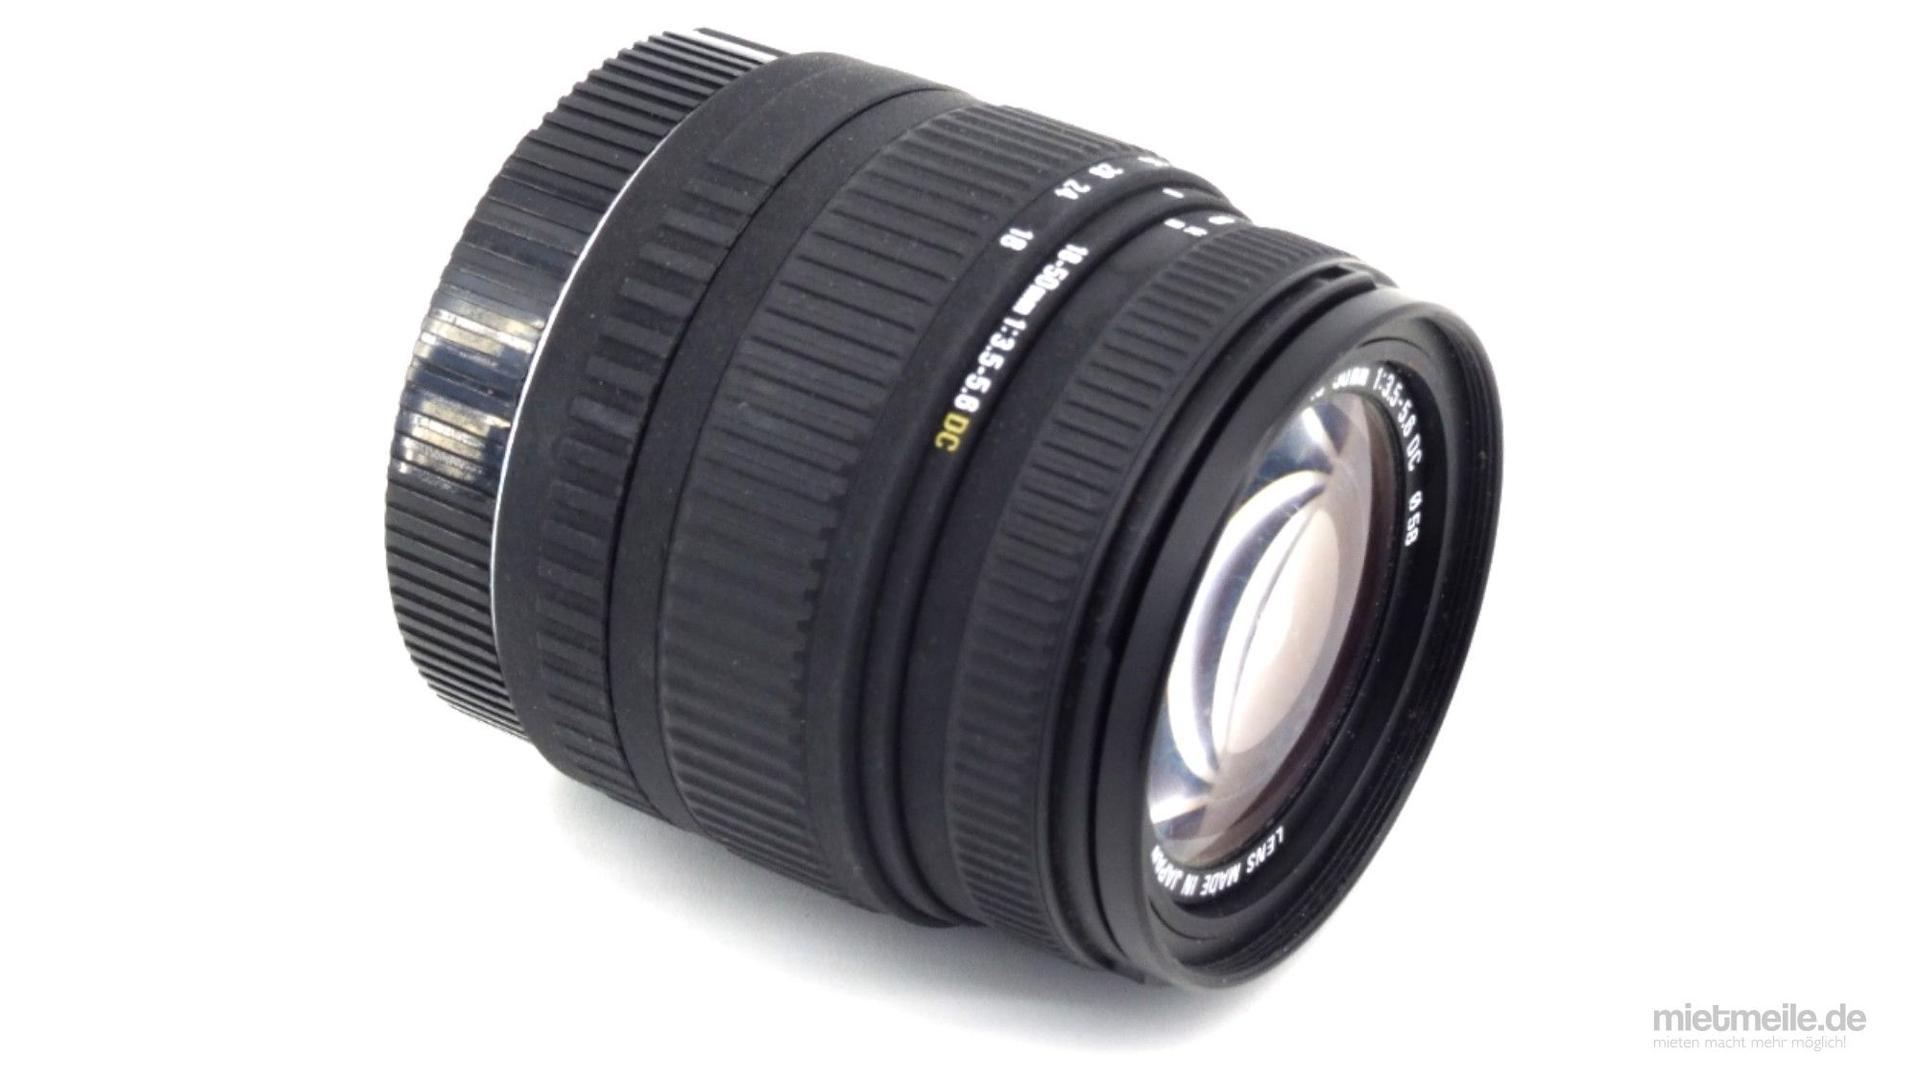 Objektive mieten & vermieten - Objektiv Sigma 18-50mm F/3,5-5,6 Canon Infrarot in Schkeuditz